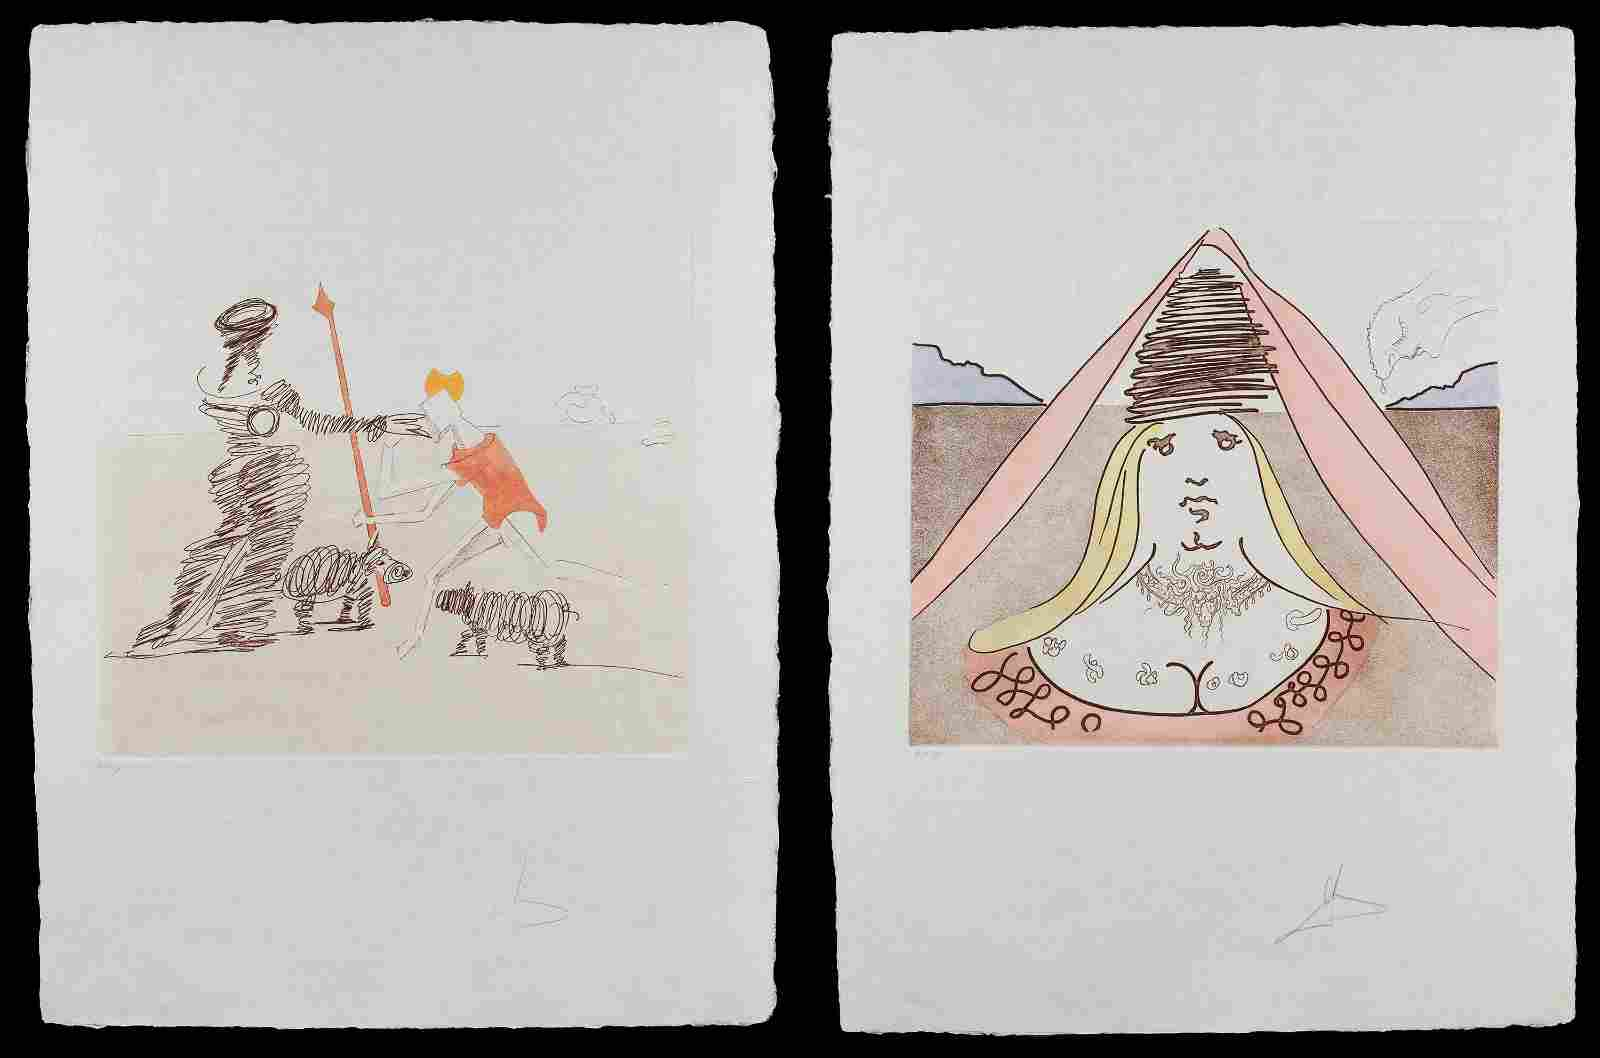 Salvador Dali (Spanish, 1904-1989) 'Pastorale' and 'The